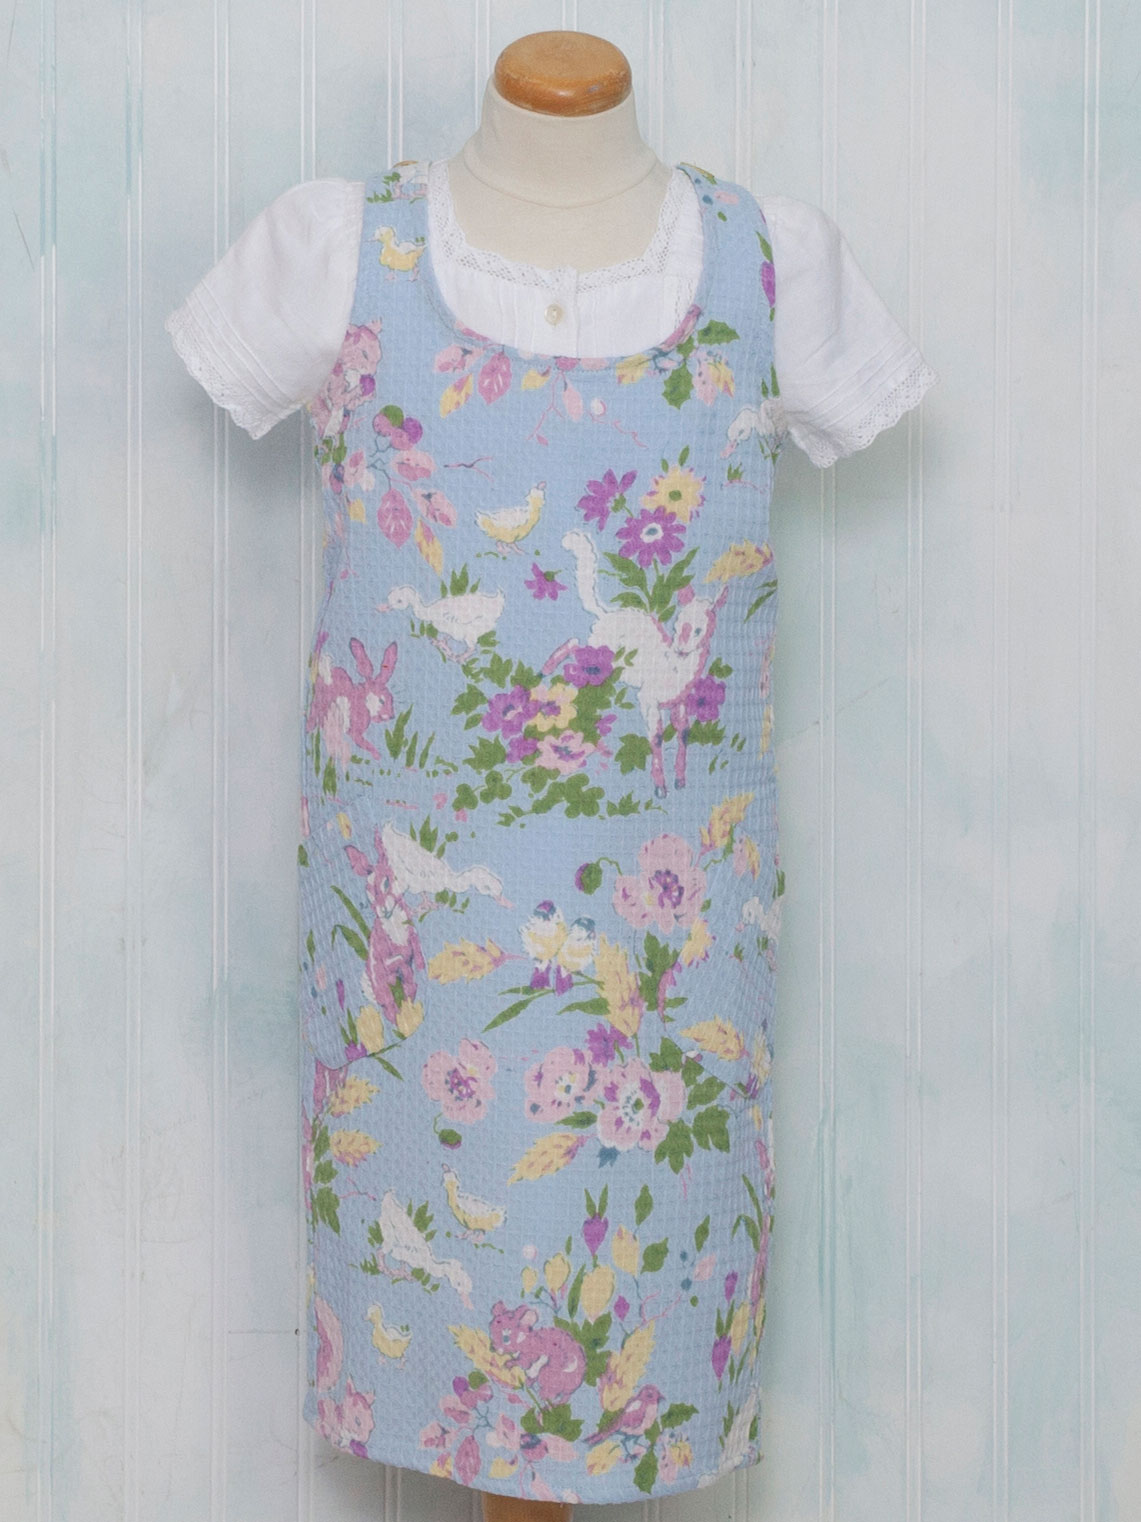 Friendly Honeycomb Kids Apron | Attic Sale, Linens & Kitchen Attic ...